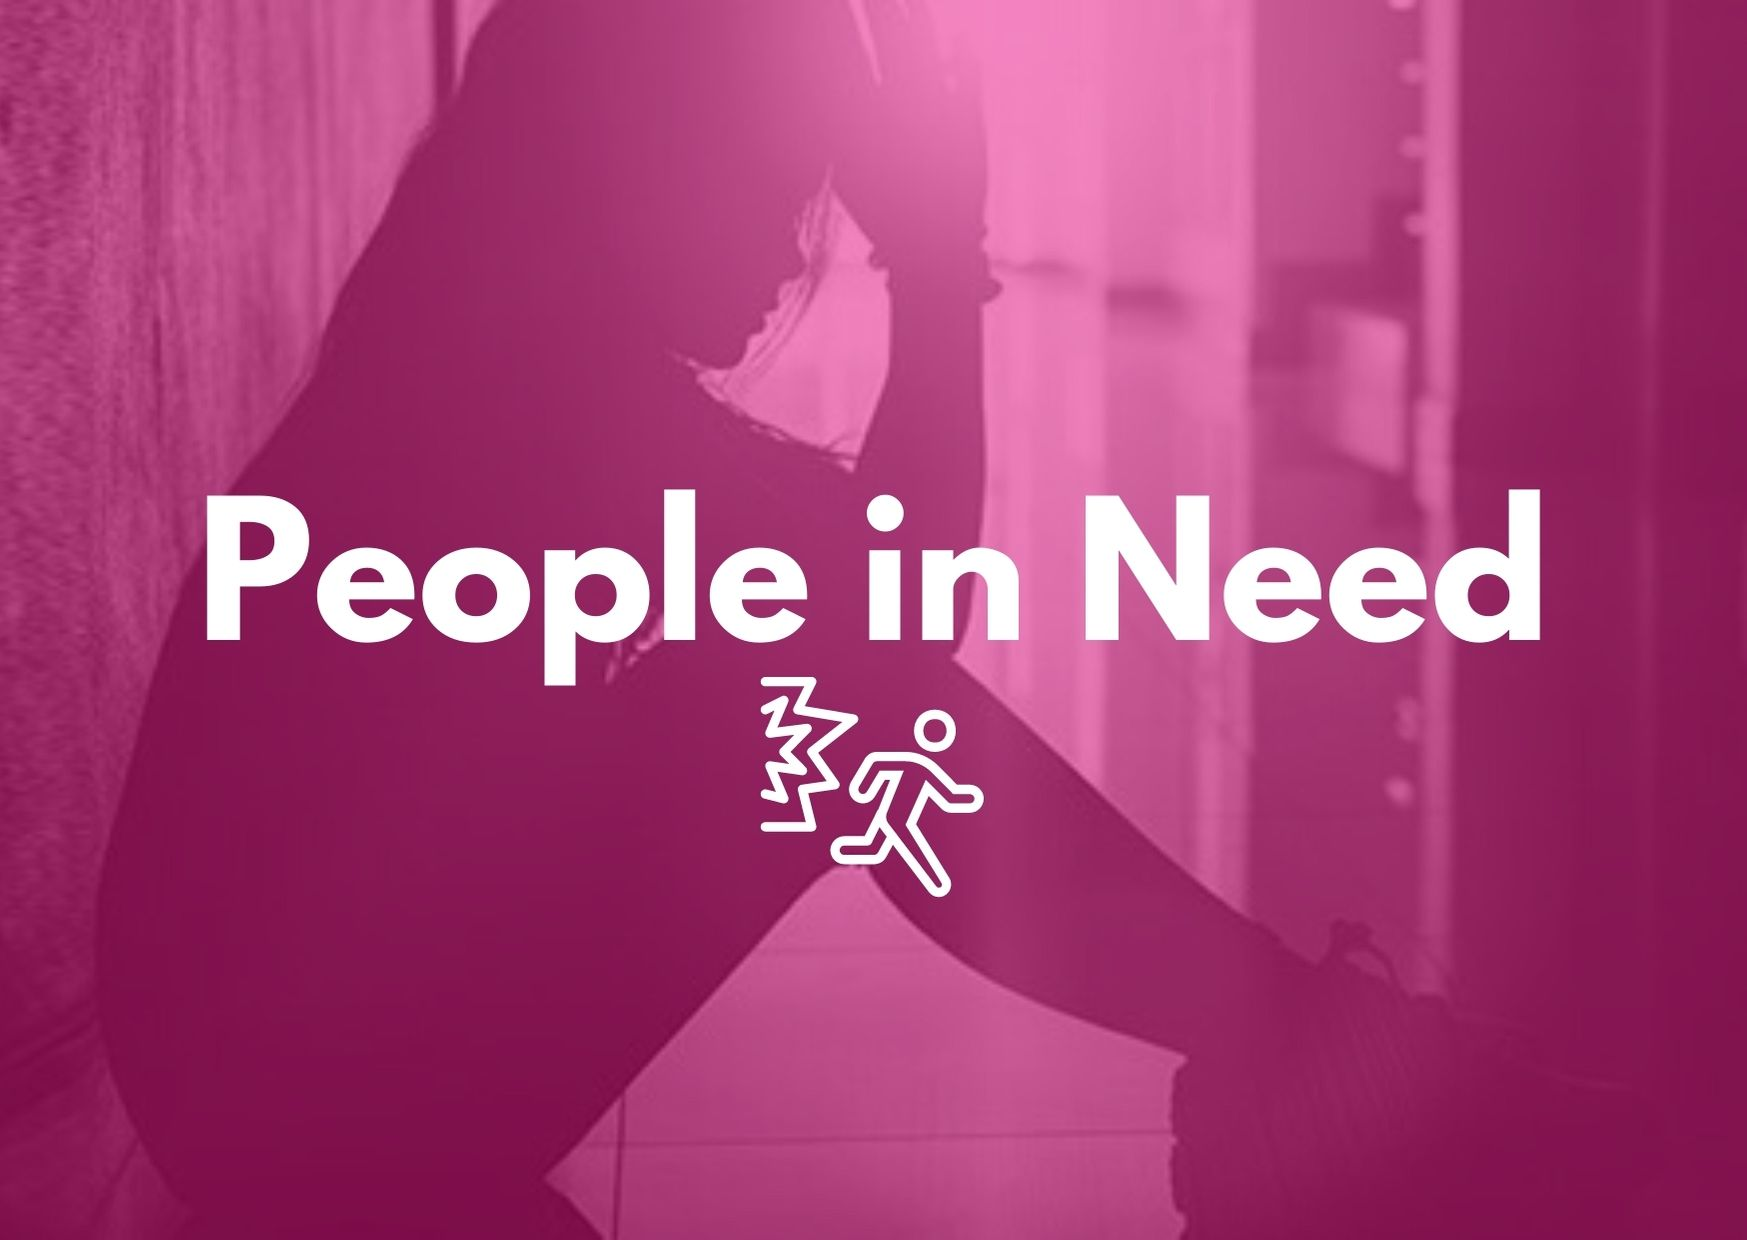 Helping Communities Thrive: People In Need